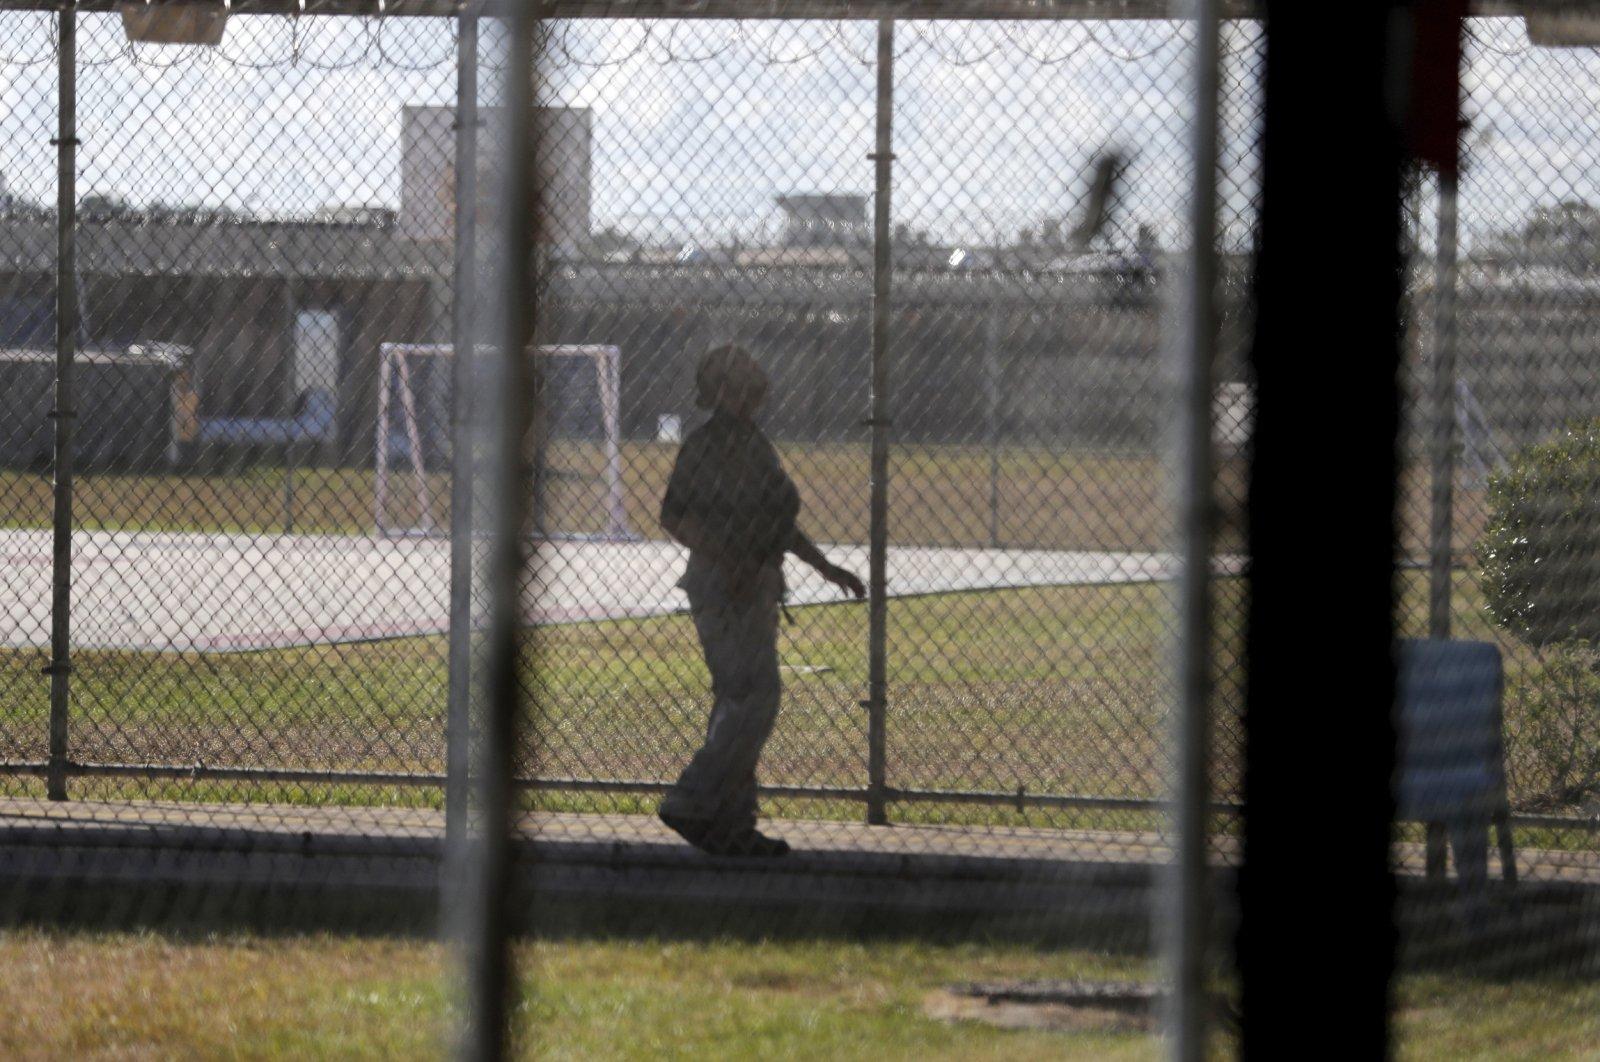 A guard walks on a path between yards during a media tour inside the Winn Correctional Center, in Winnfield, Louisiana, U.S., Sept. 26, 2019. (AP Photo)